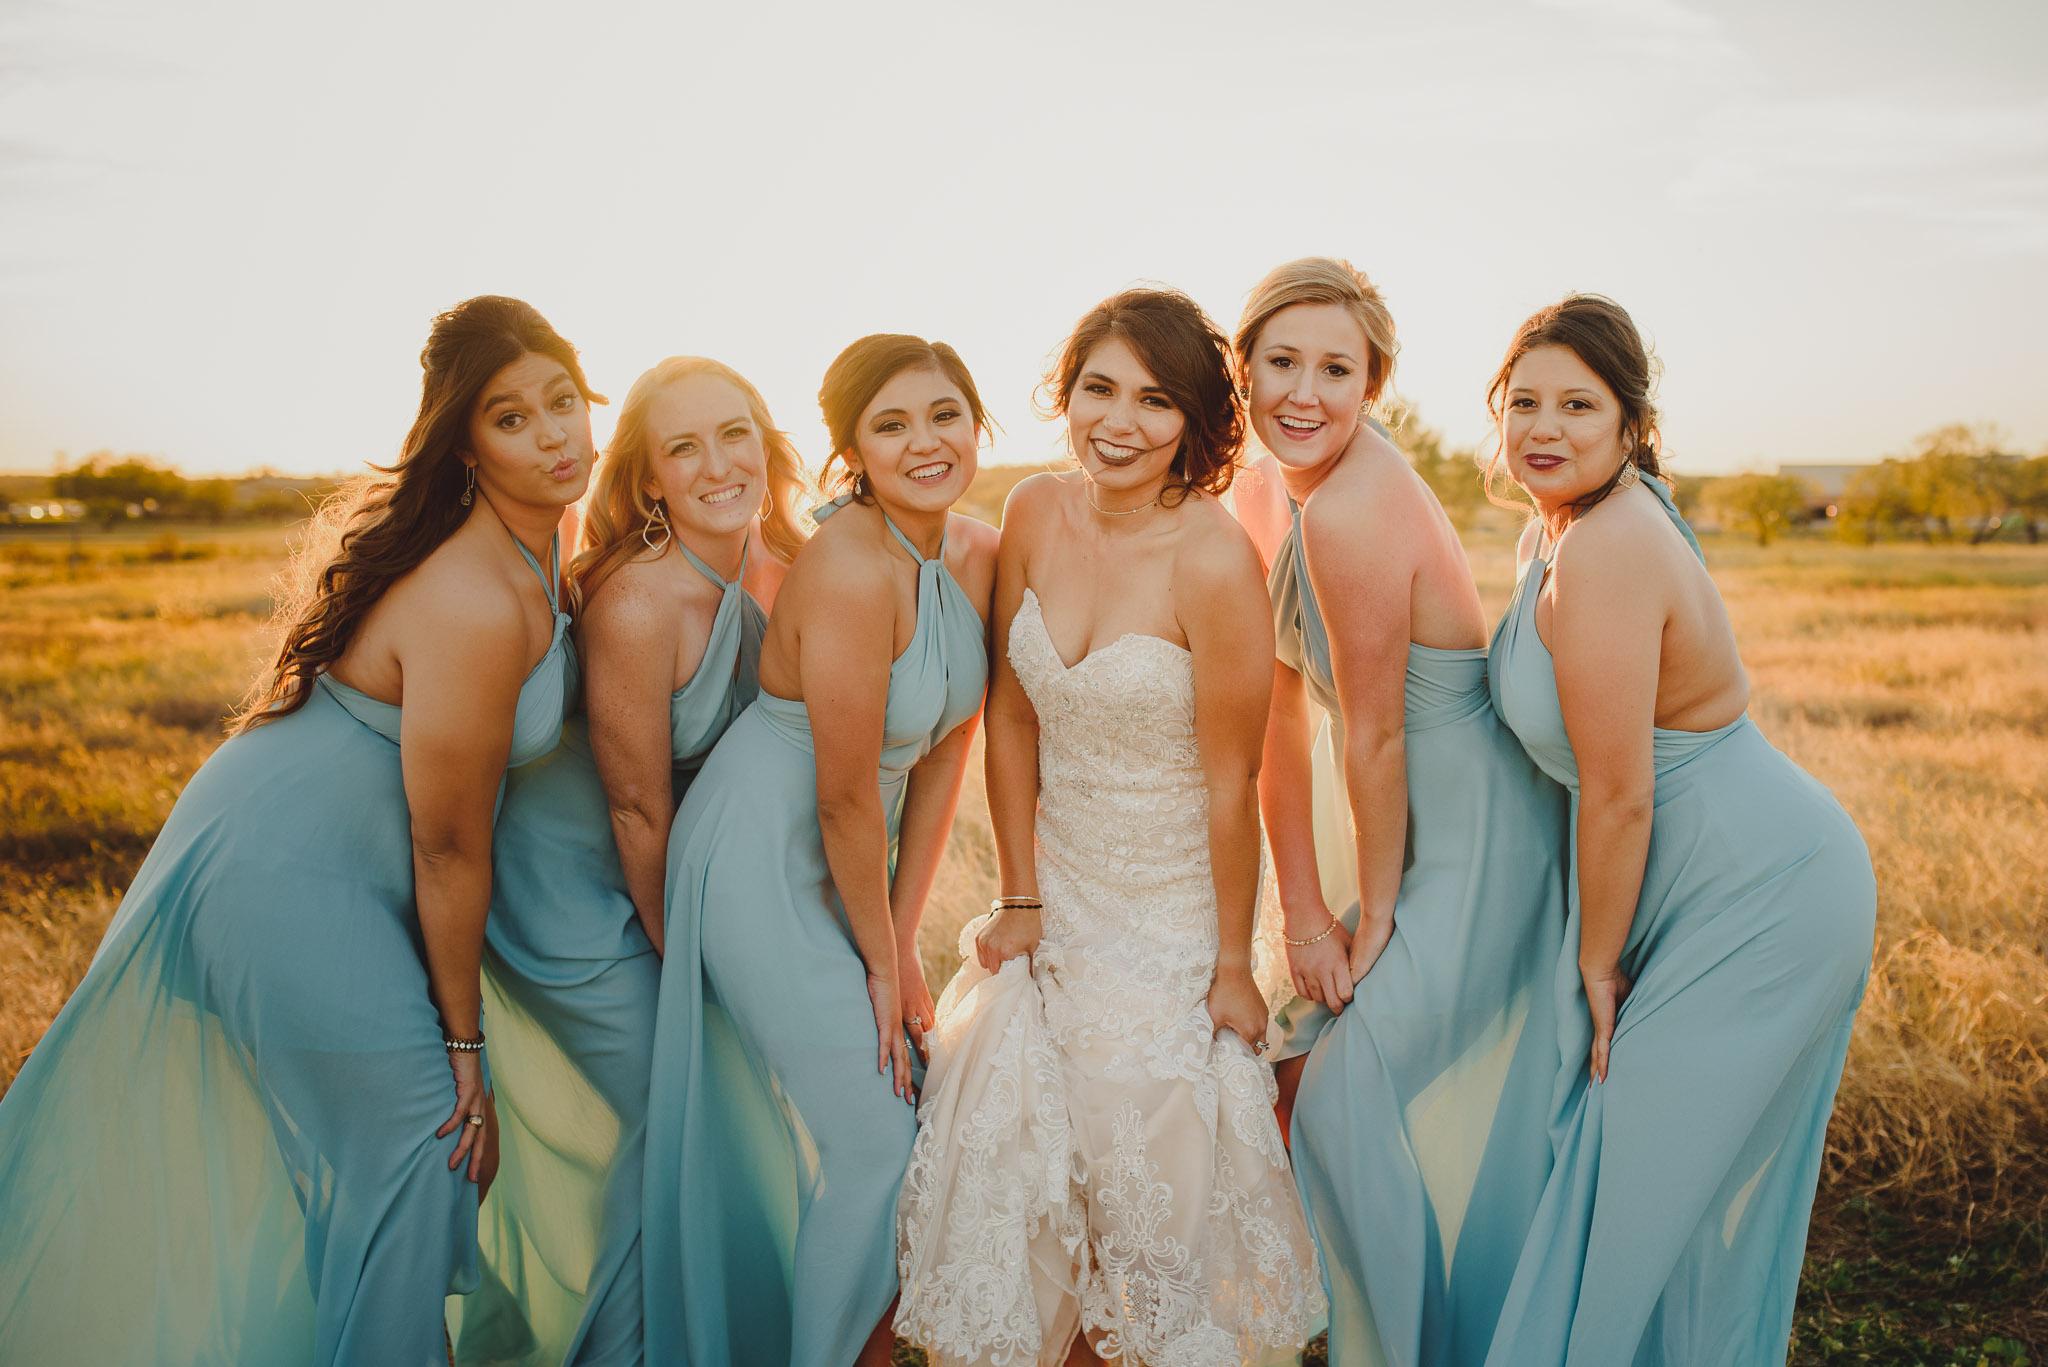 Zandra with her bridesmaids - San Angelo, Texas